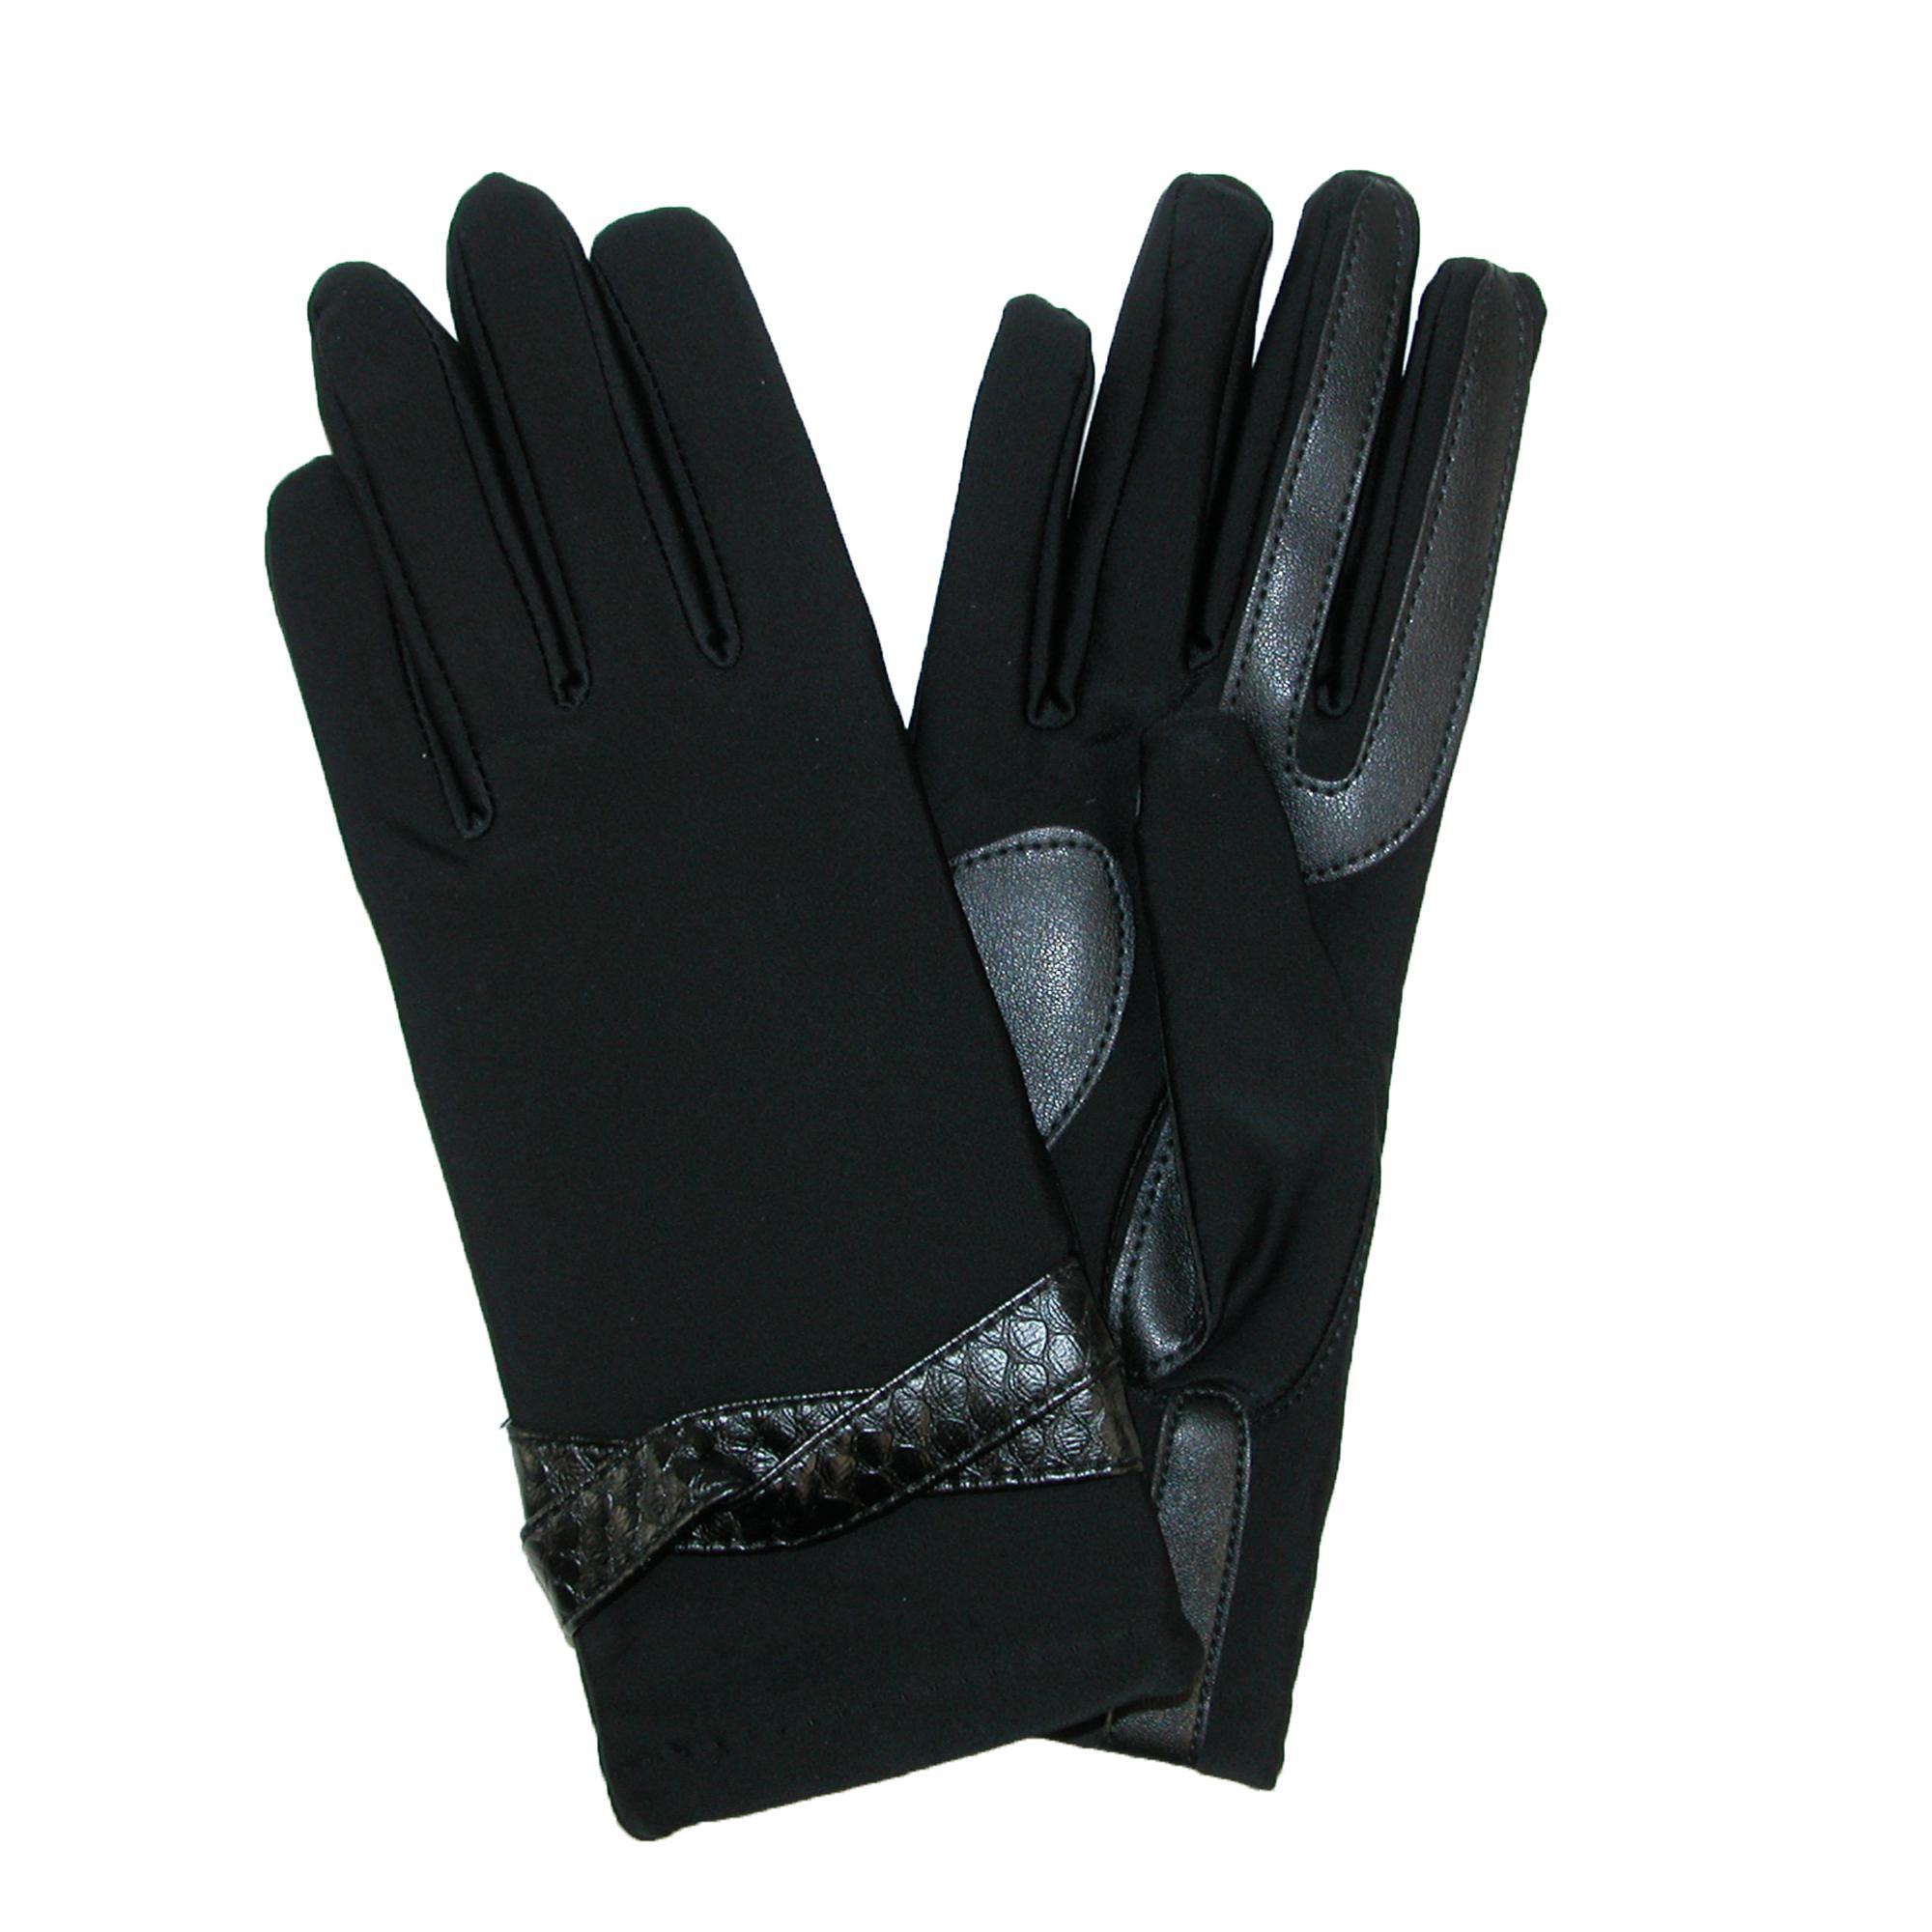 Isotoner Womens Fashion Gloves With Snake Print Belt